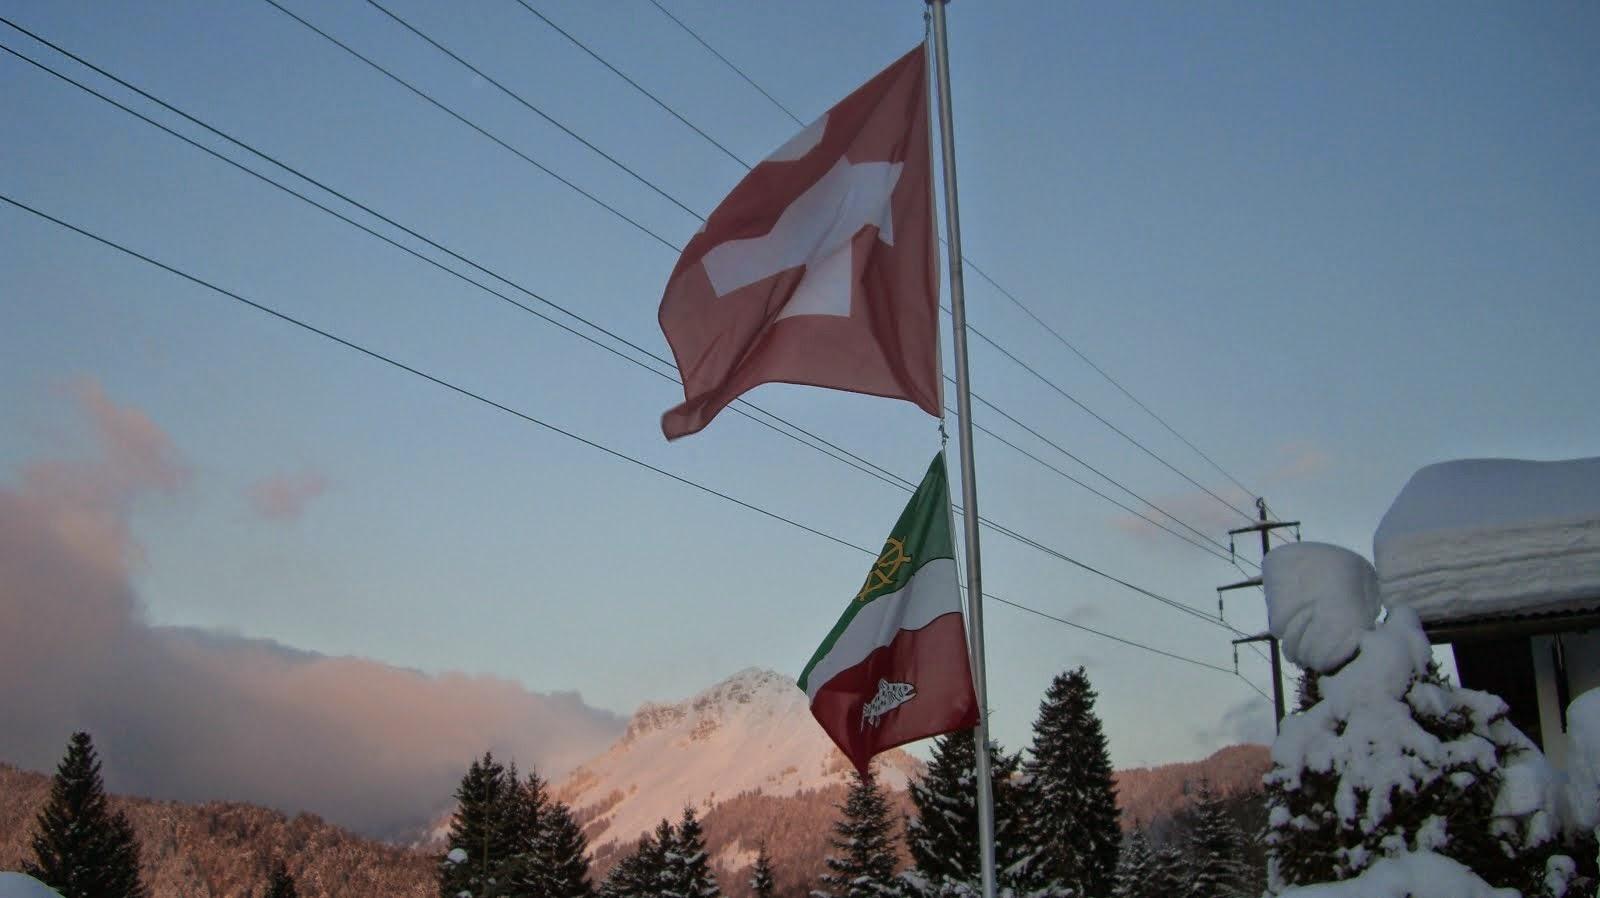 Un drapeau connu...